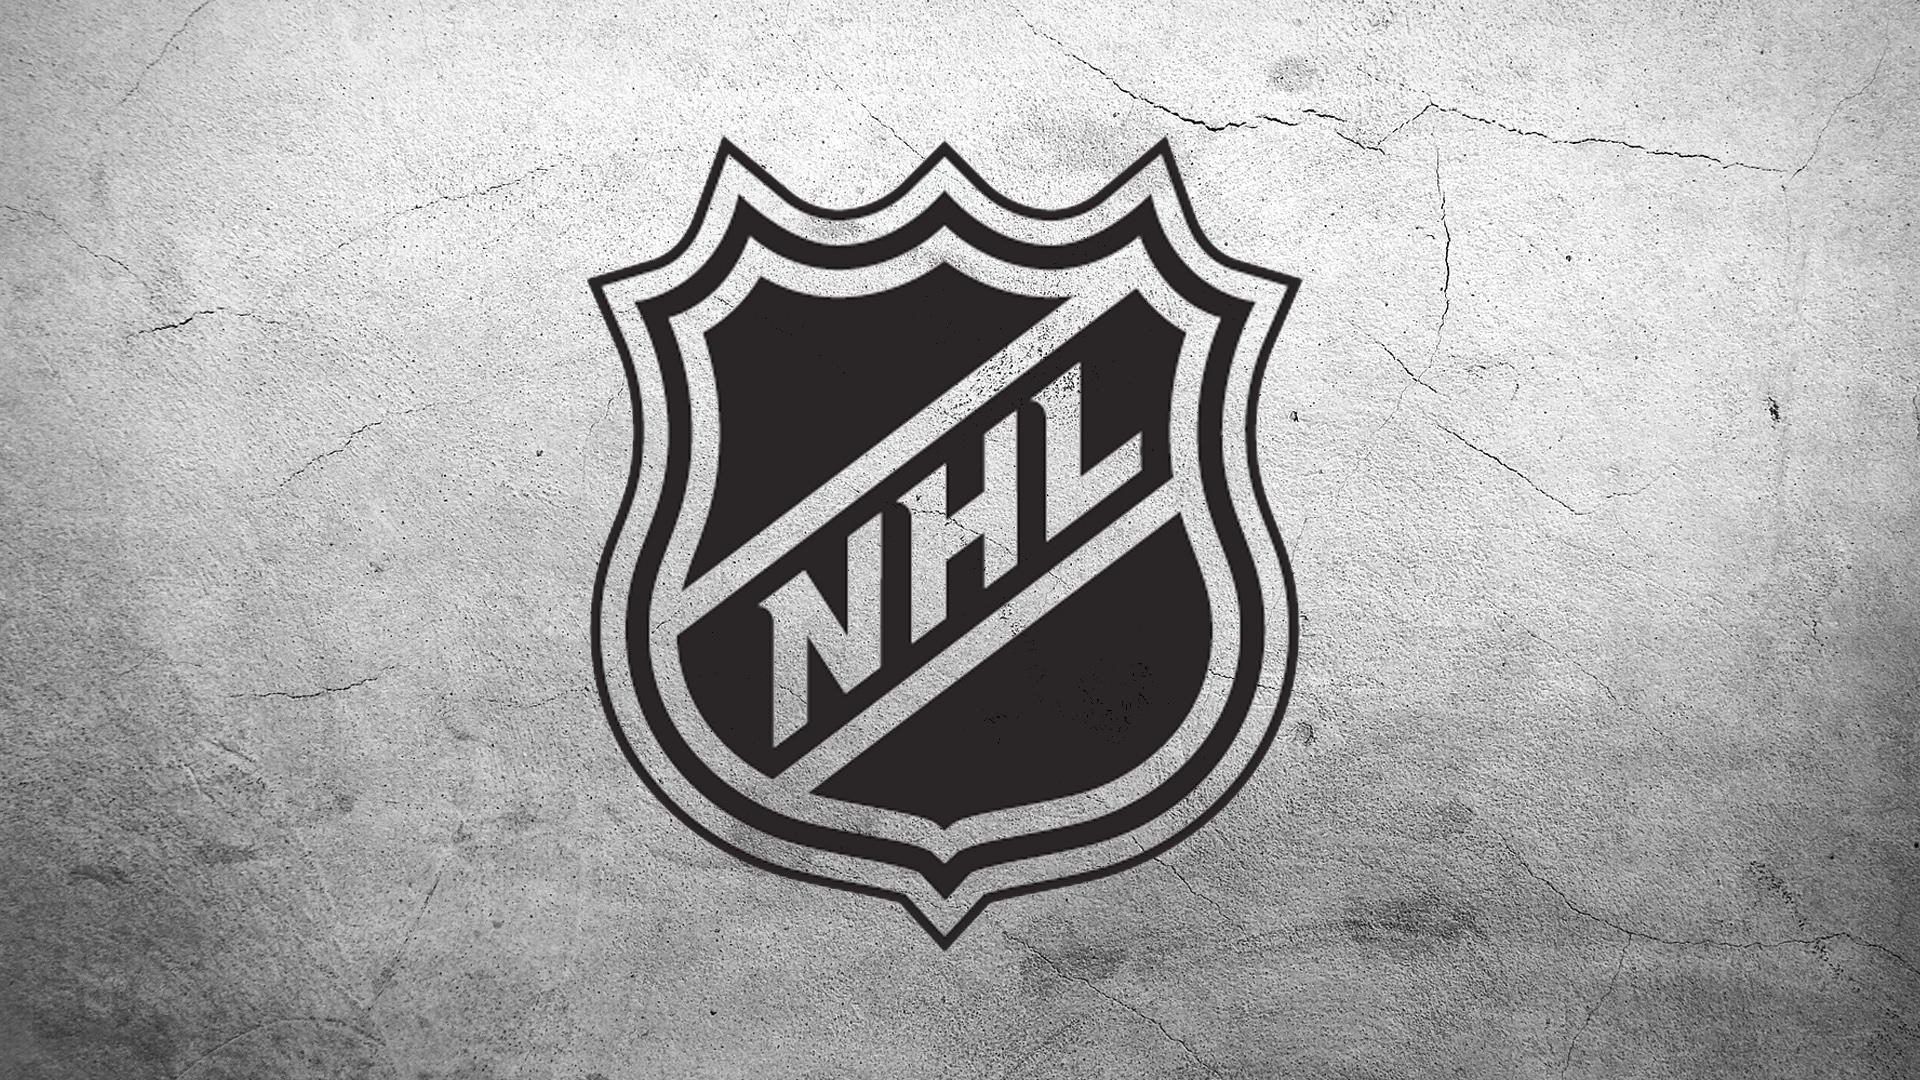 NHL seeking quarantine exemption for teams ahead of playoff games